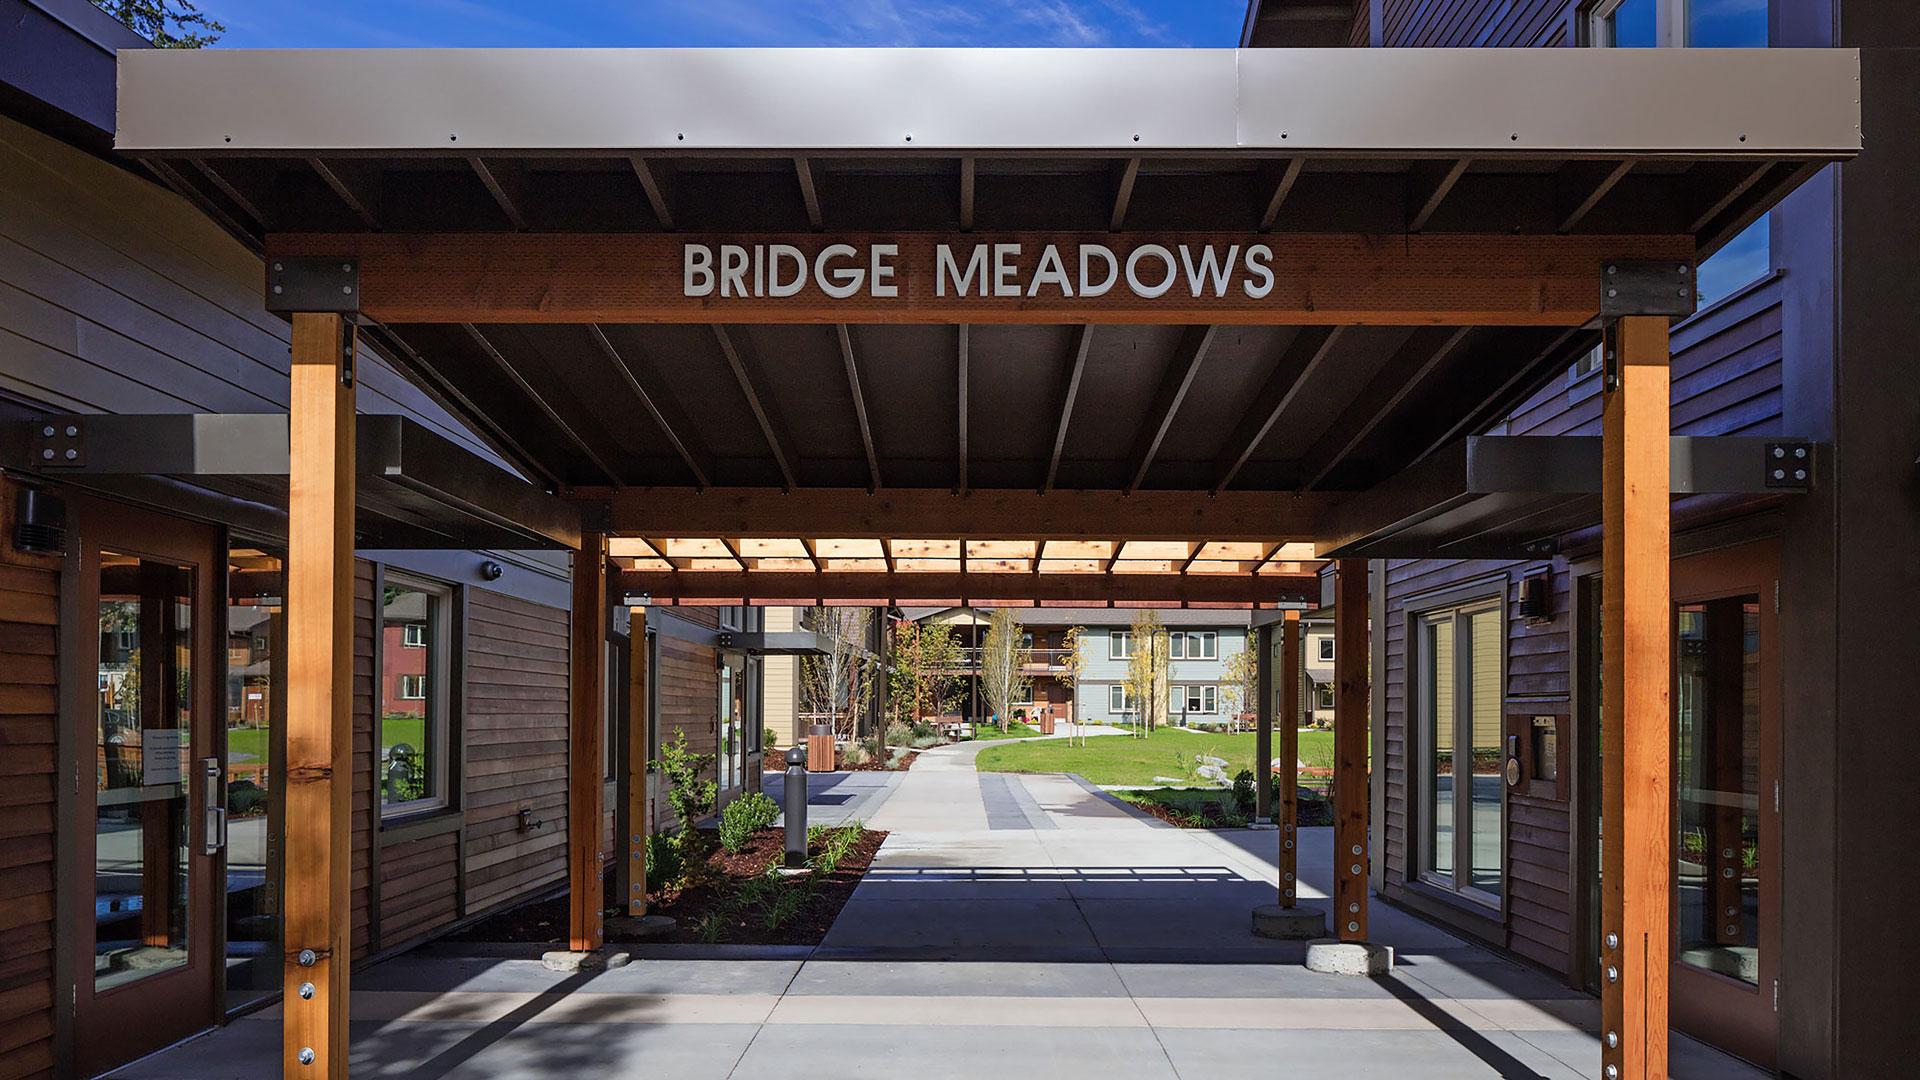 BridgeMeadowsBeaverton_SLIDE_RedStudio0006.jpg